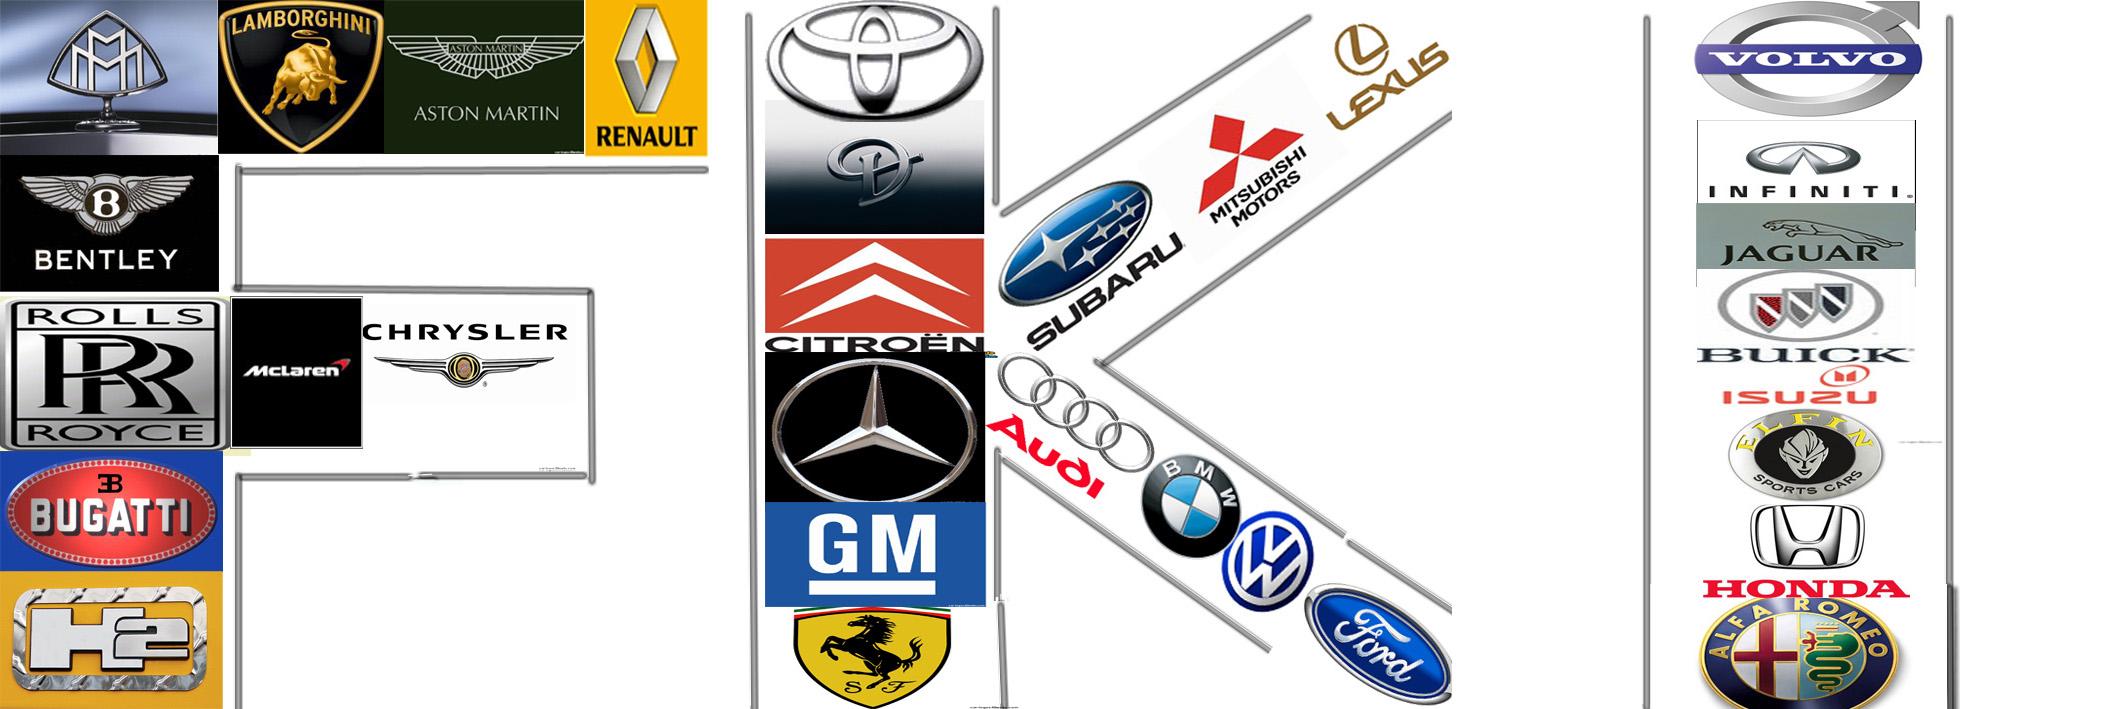 Luxury Car Symbols More Information